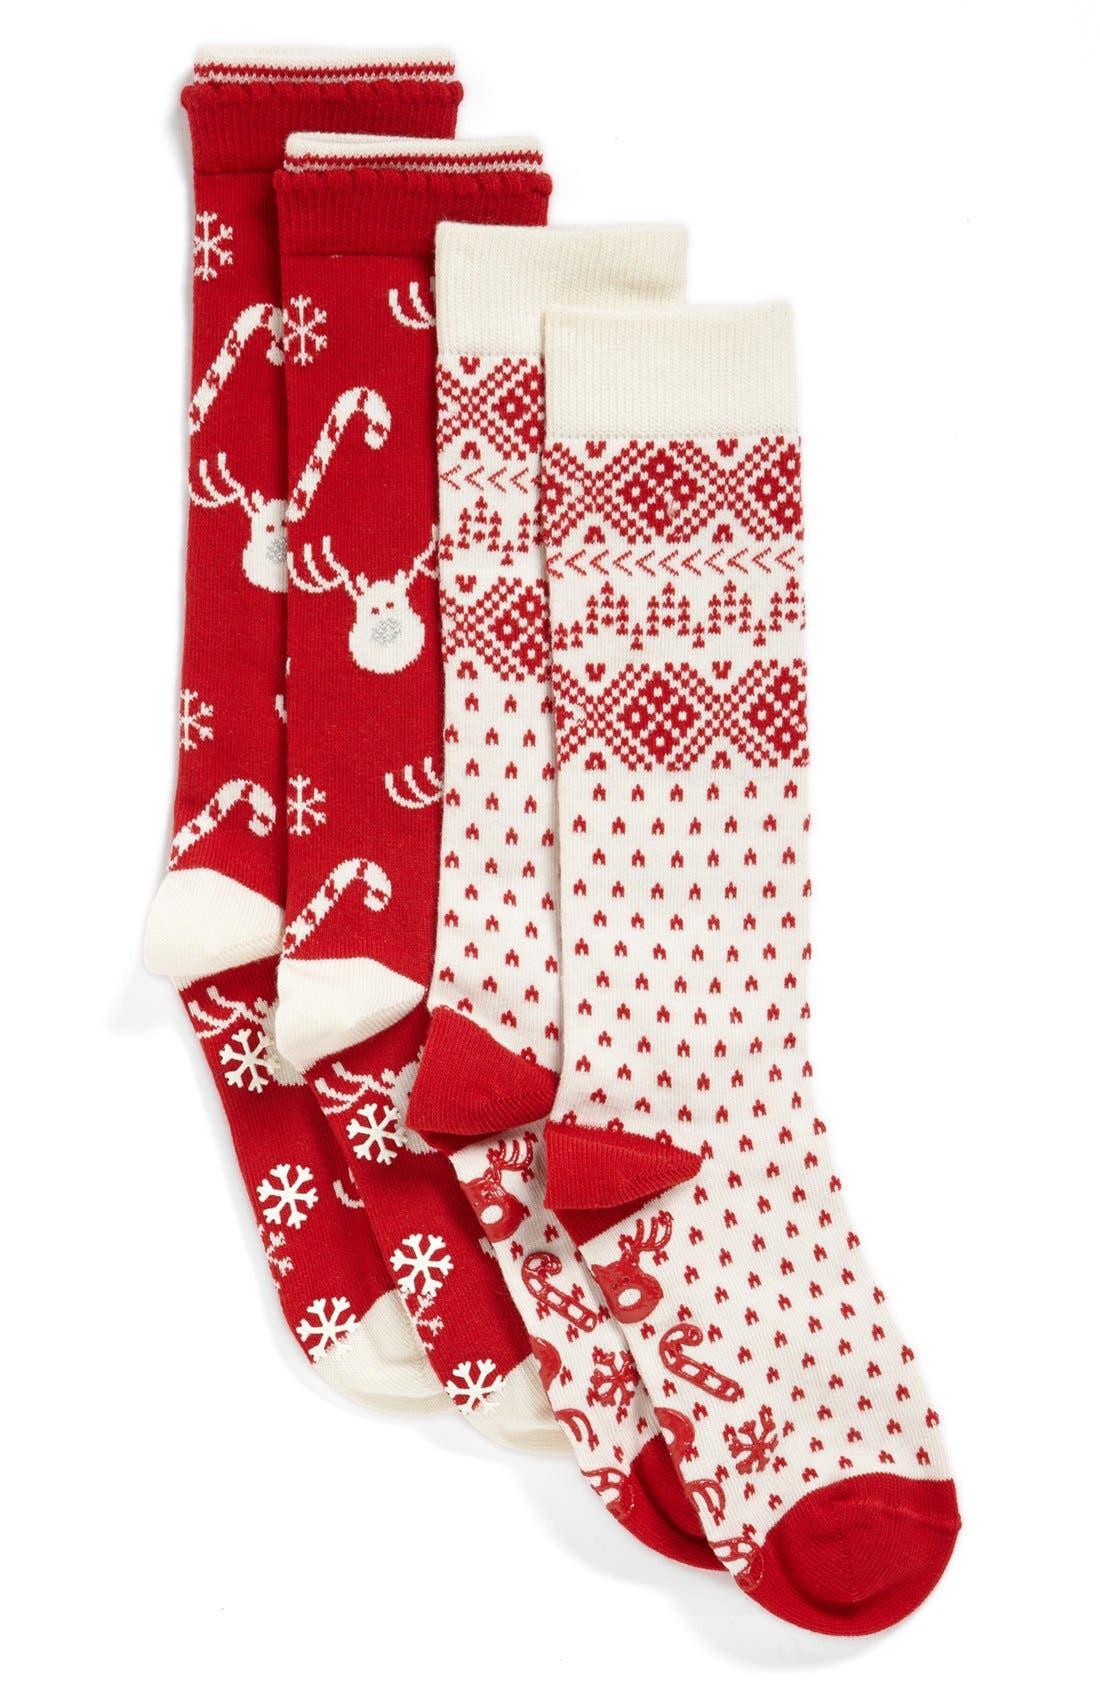 Alternate Image 1 Selected - Nordstrom 'Reindeer' Fair Isle Knee Socks (2-Pack) (Little Girls)